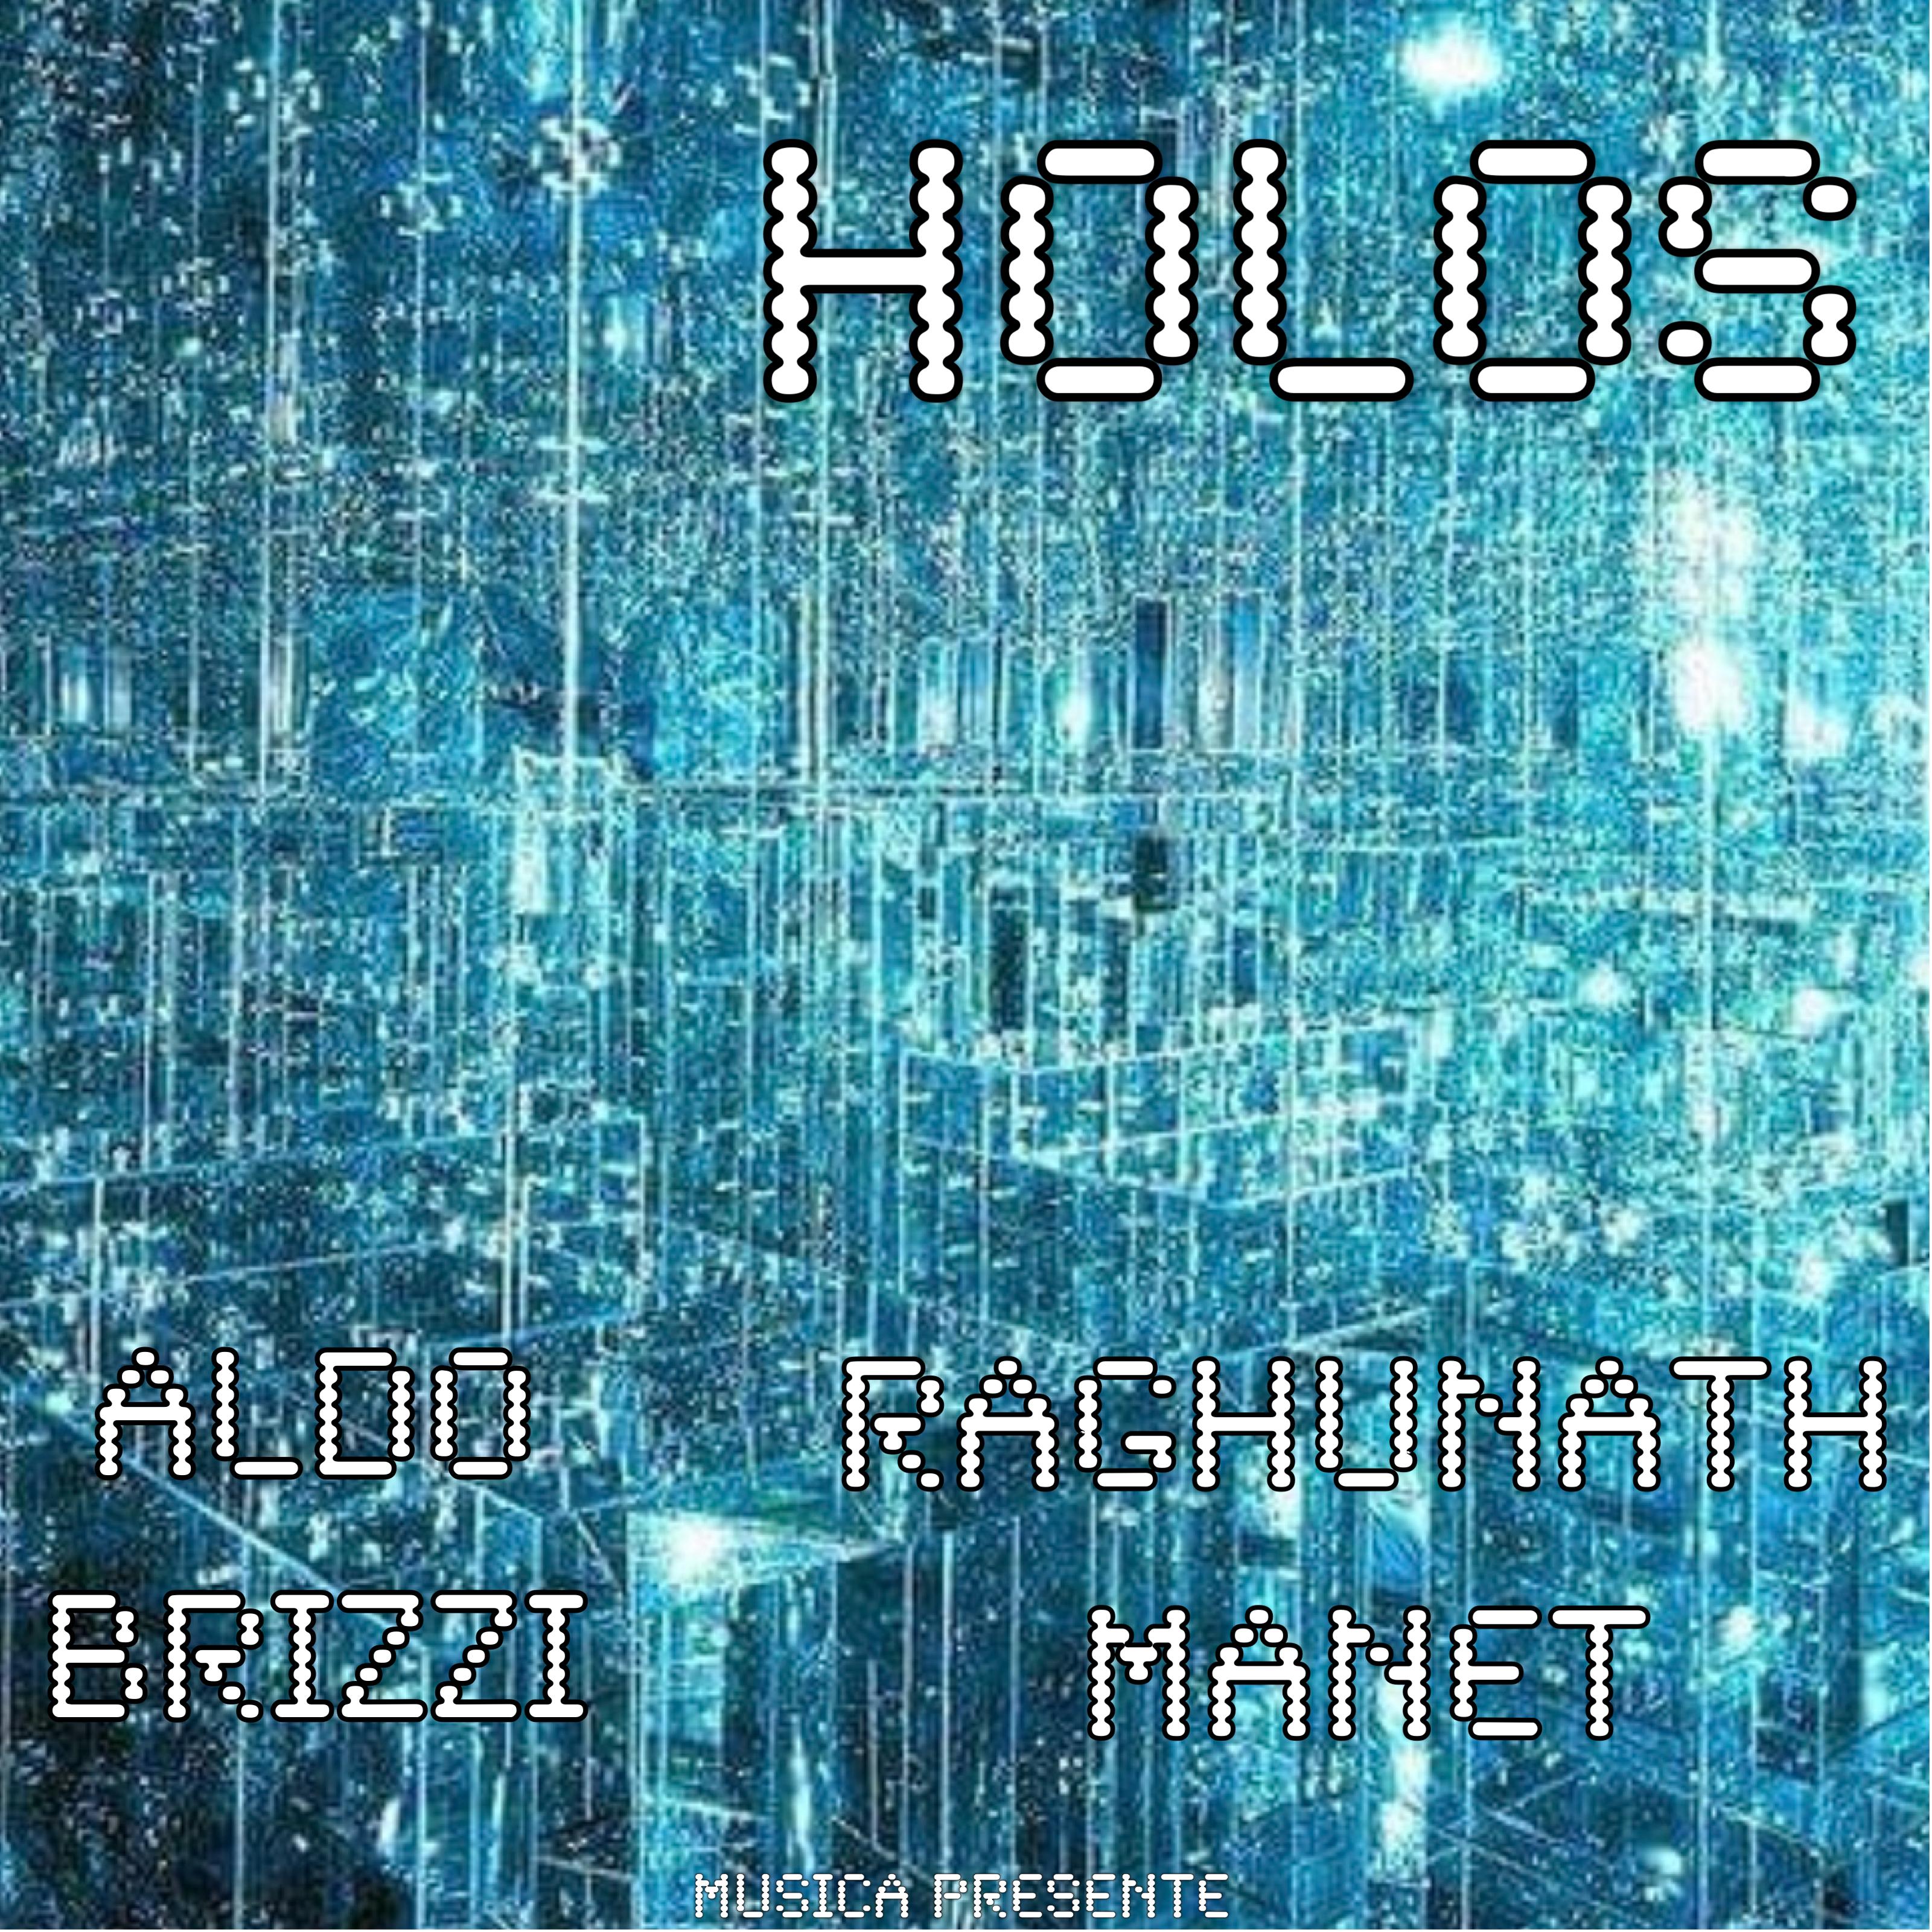 """HOLOS"" (MUSICA PRESENTE Records) a true masterwork by ALDO BRIZZI and RAGHUNATH MANET."